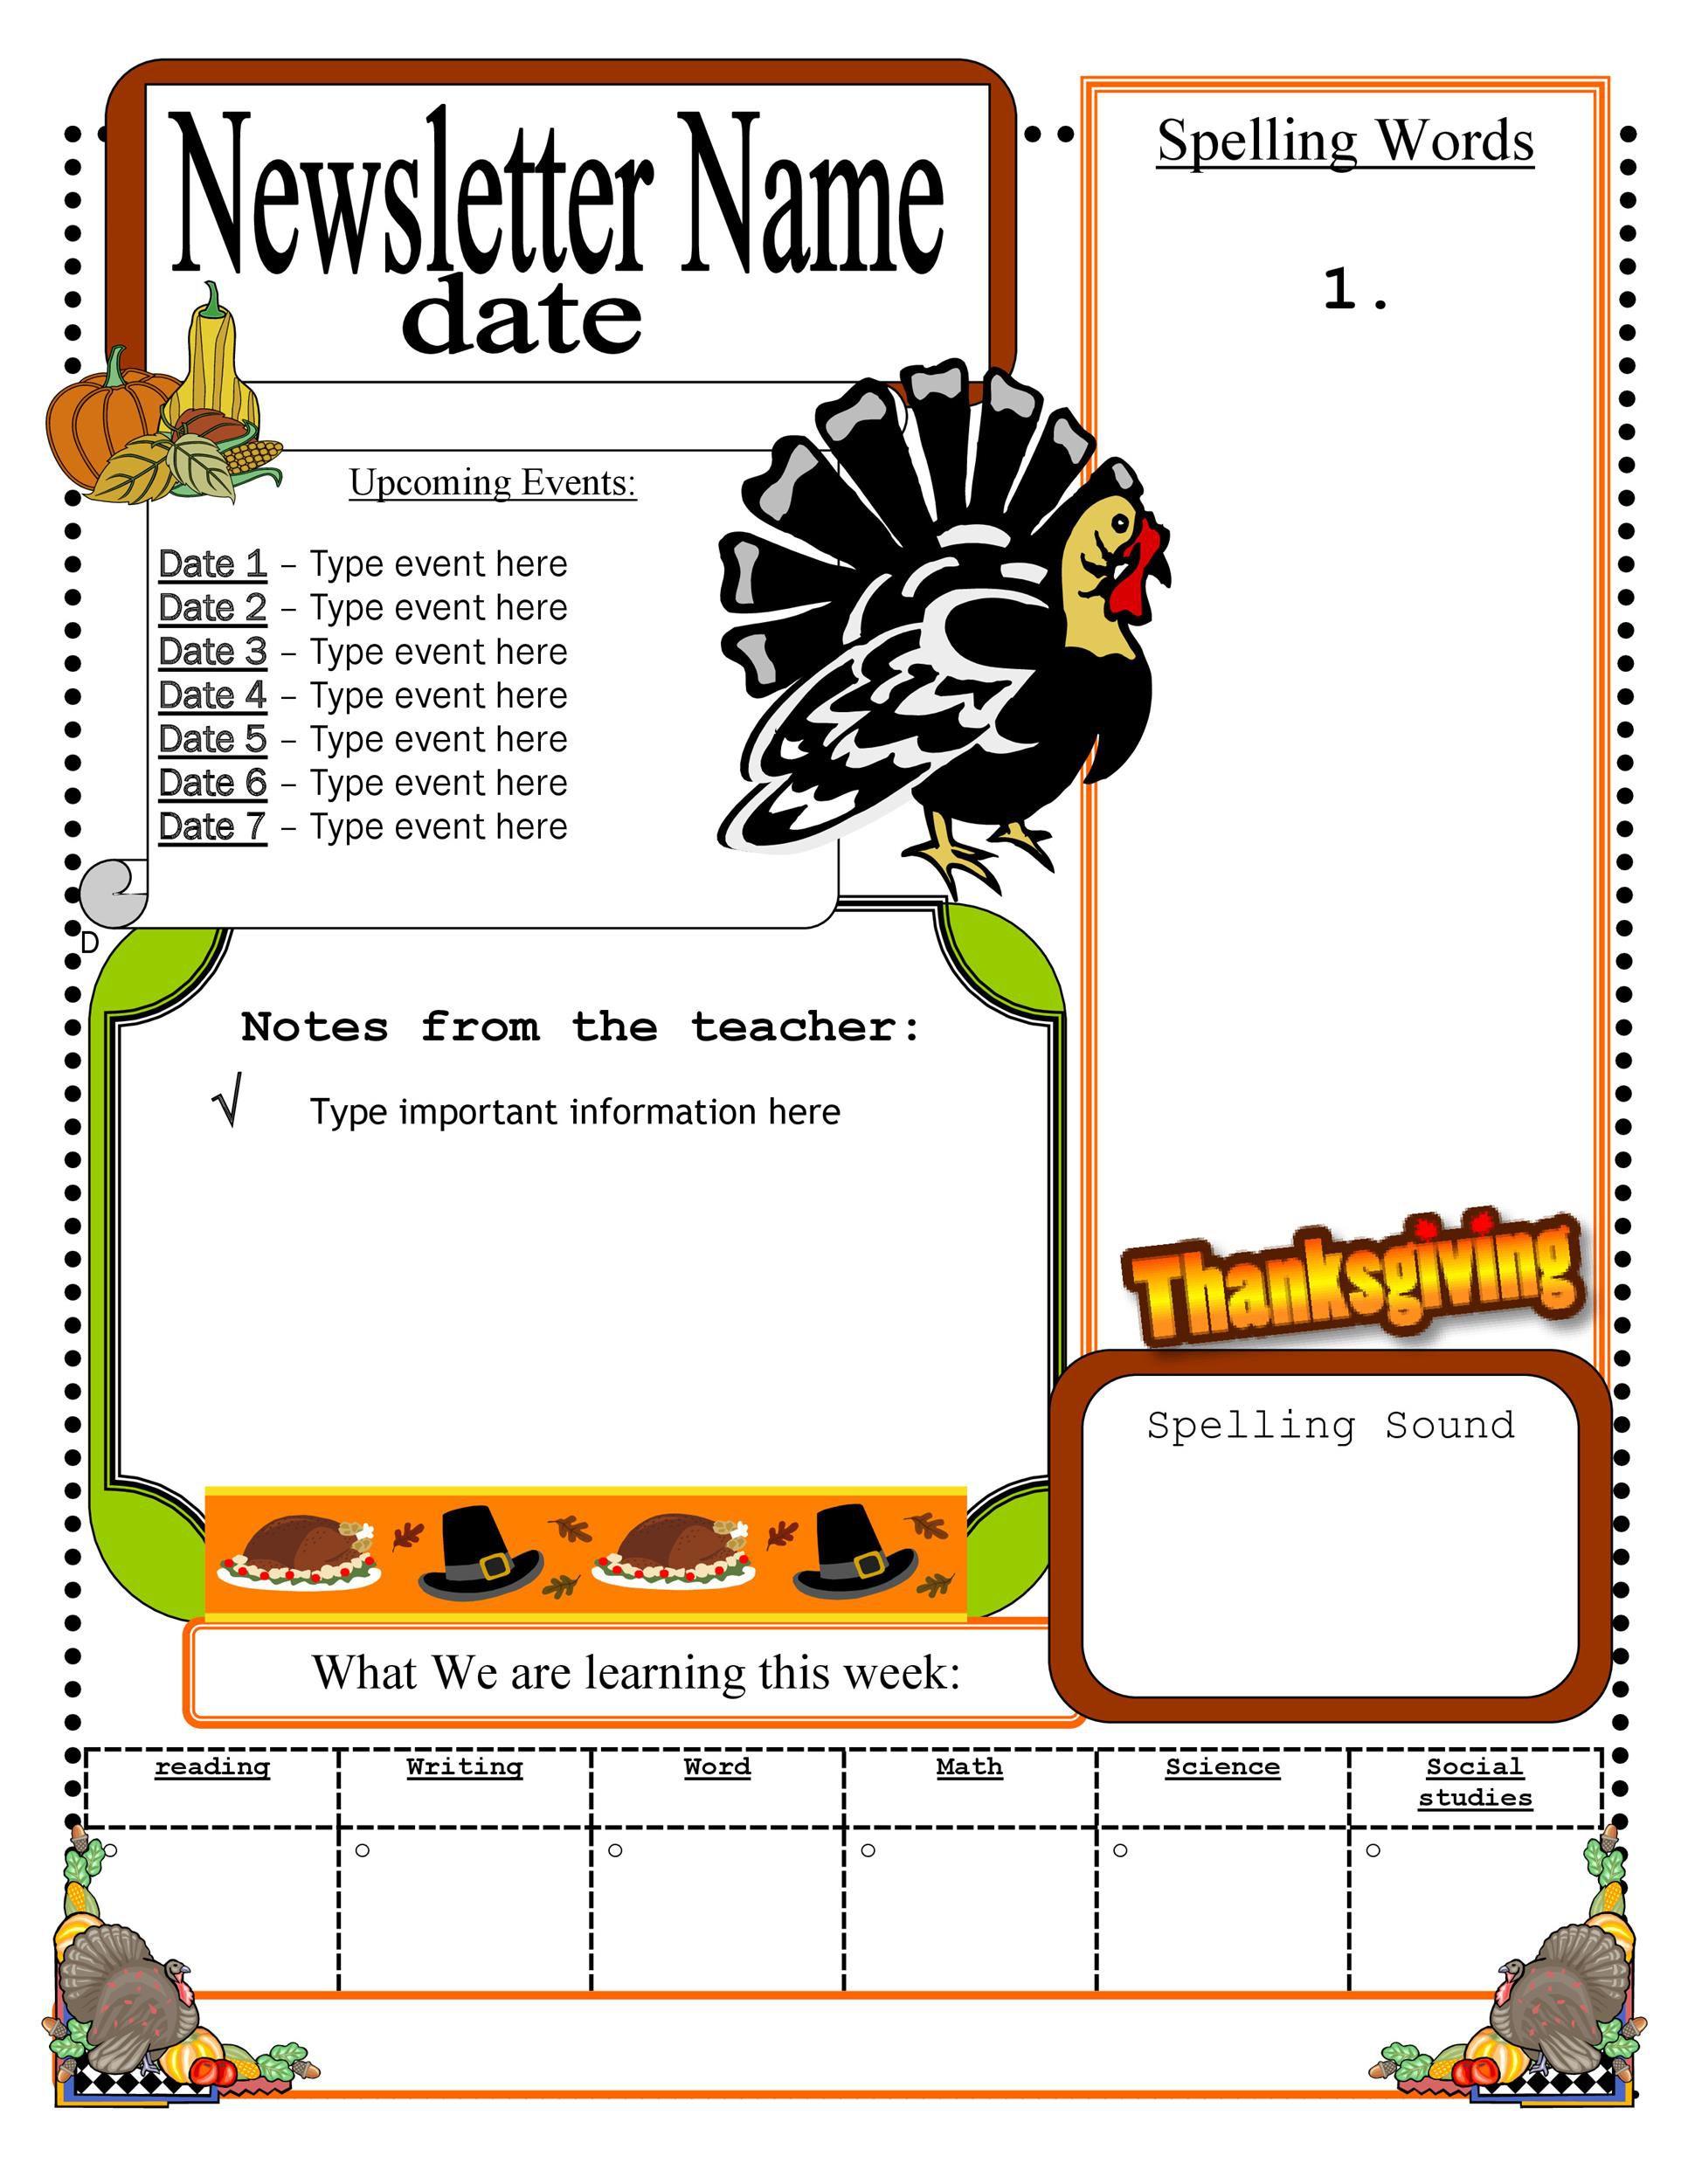 006 Sensational Newsletter Template For Teacher High Resolution  Teachers To Parent Printable Free SchoolFull